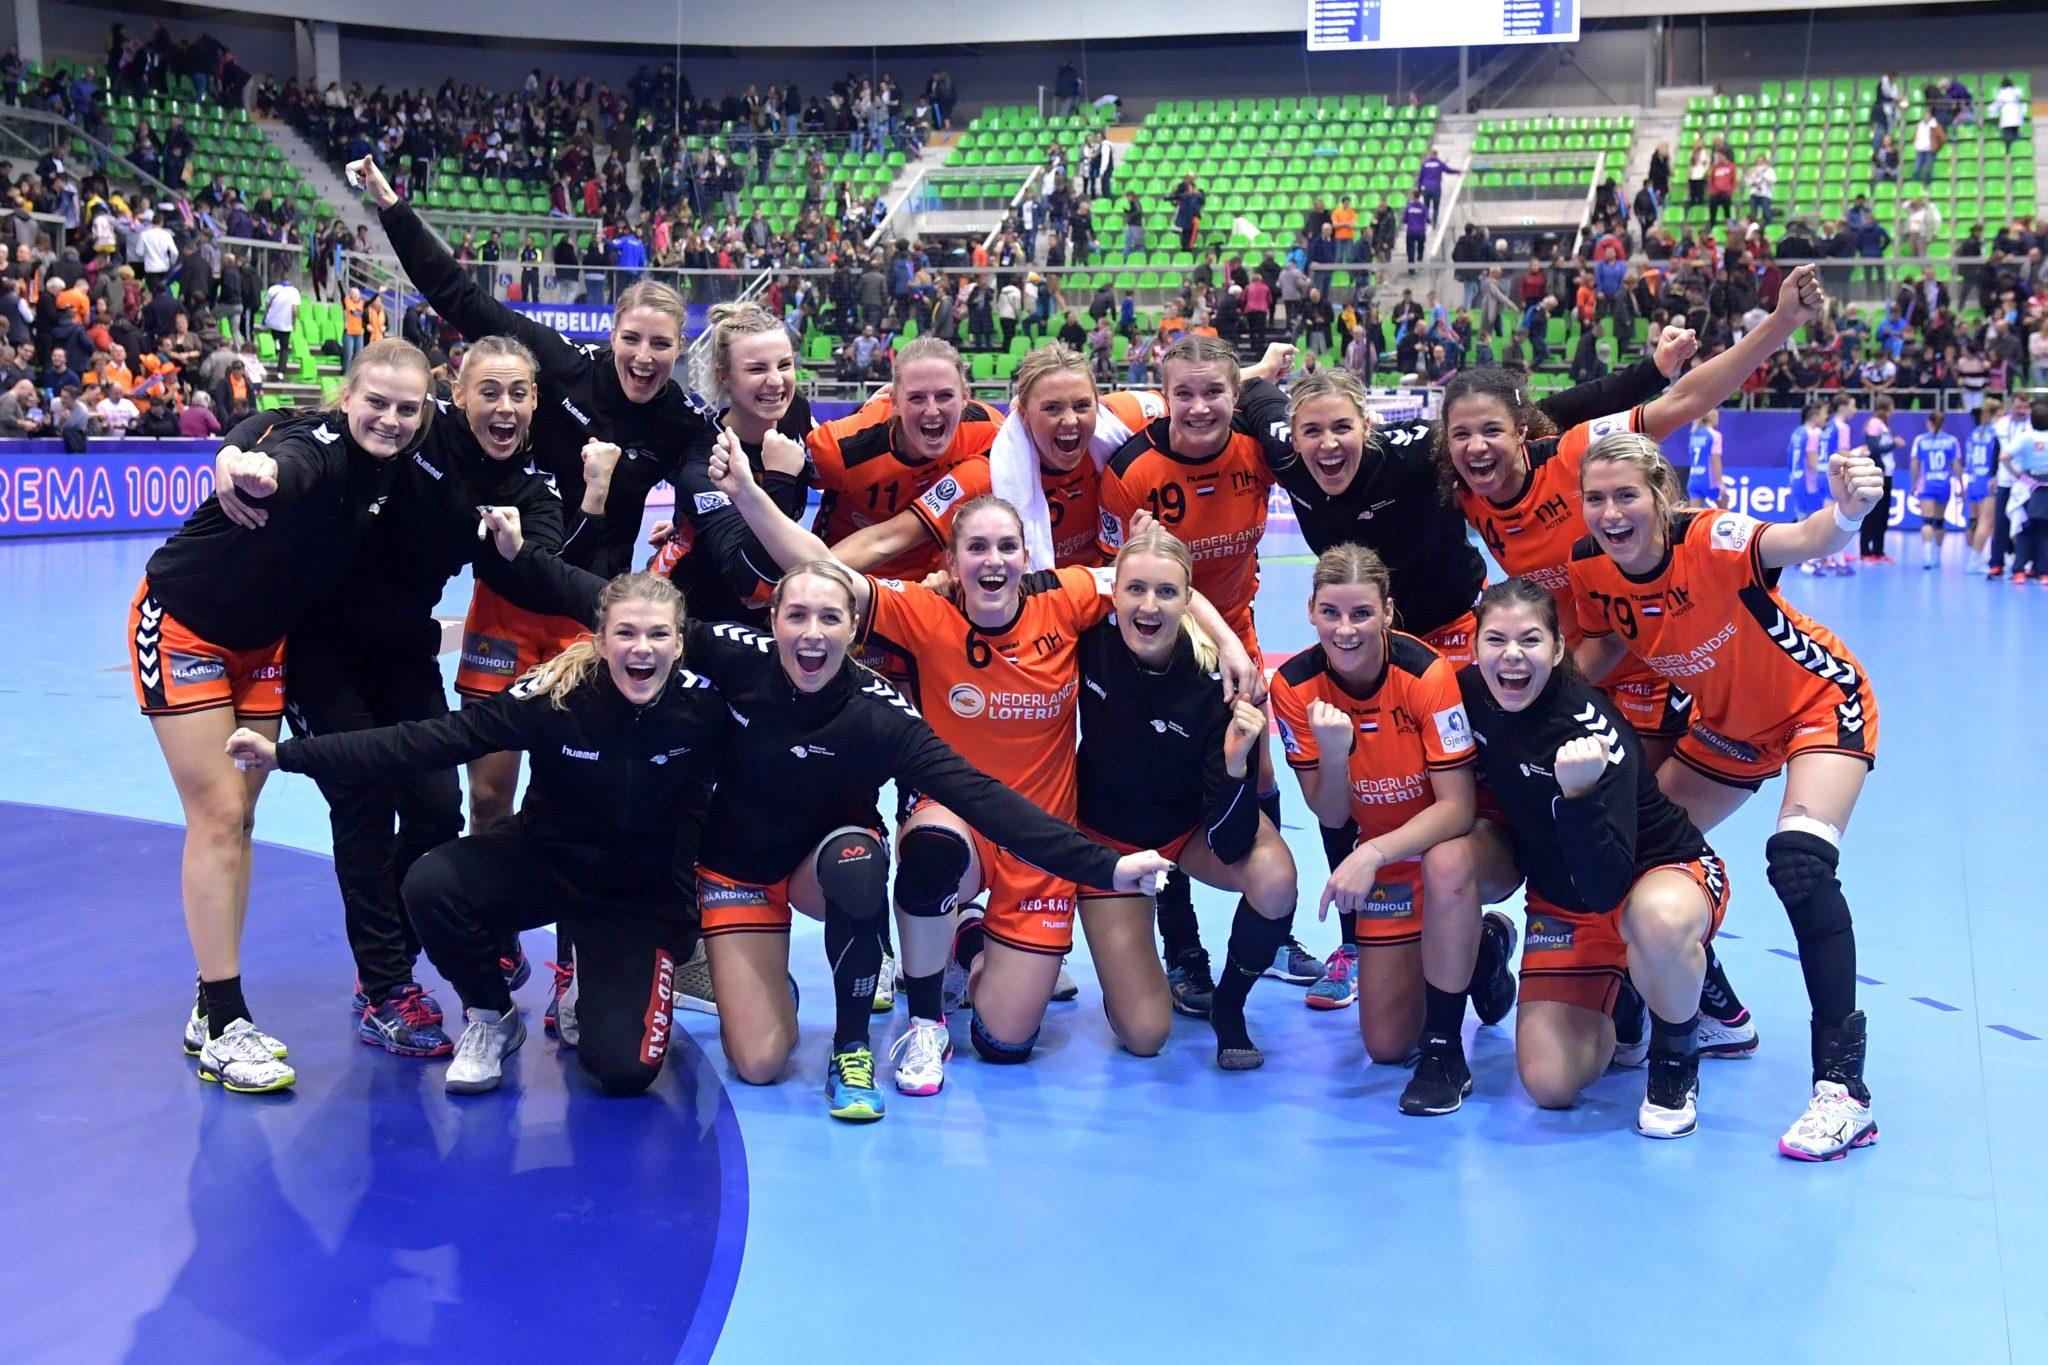 05-12-2018: EK Handbal Vrouwen: Nederland V Kroatie: MontBeliard EK Handbal In Frankrijk, Voorronde Groep C Nederland - Kroatie Overwinningsfoto